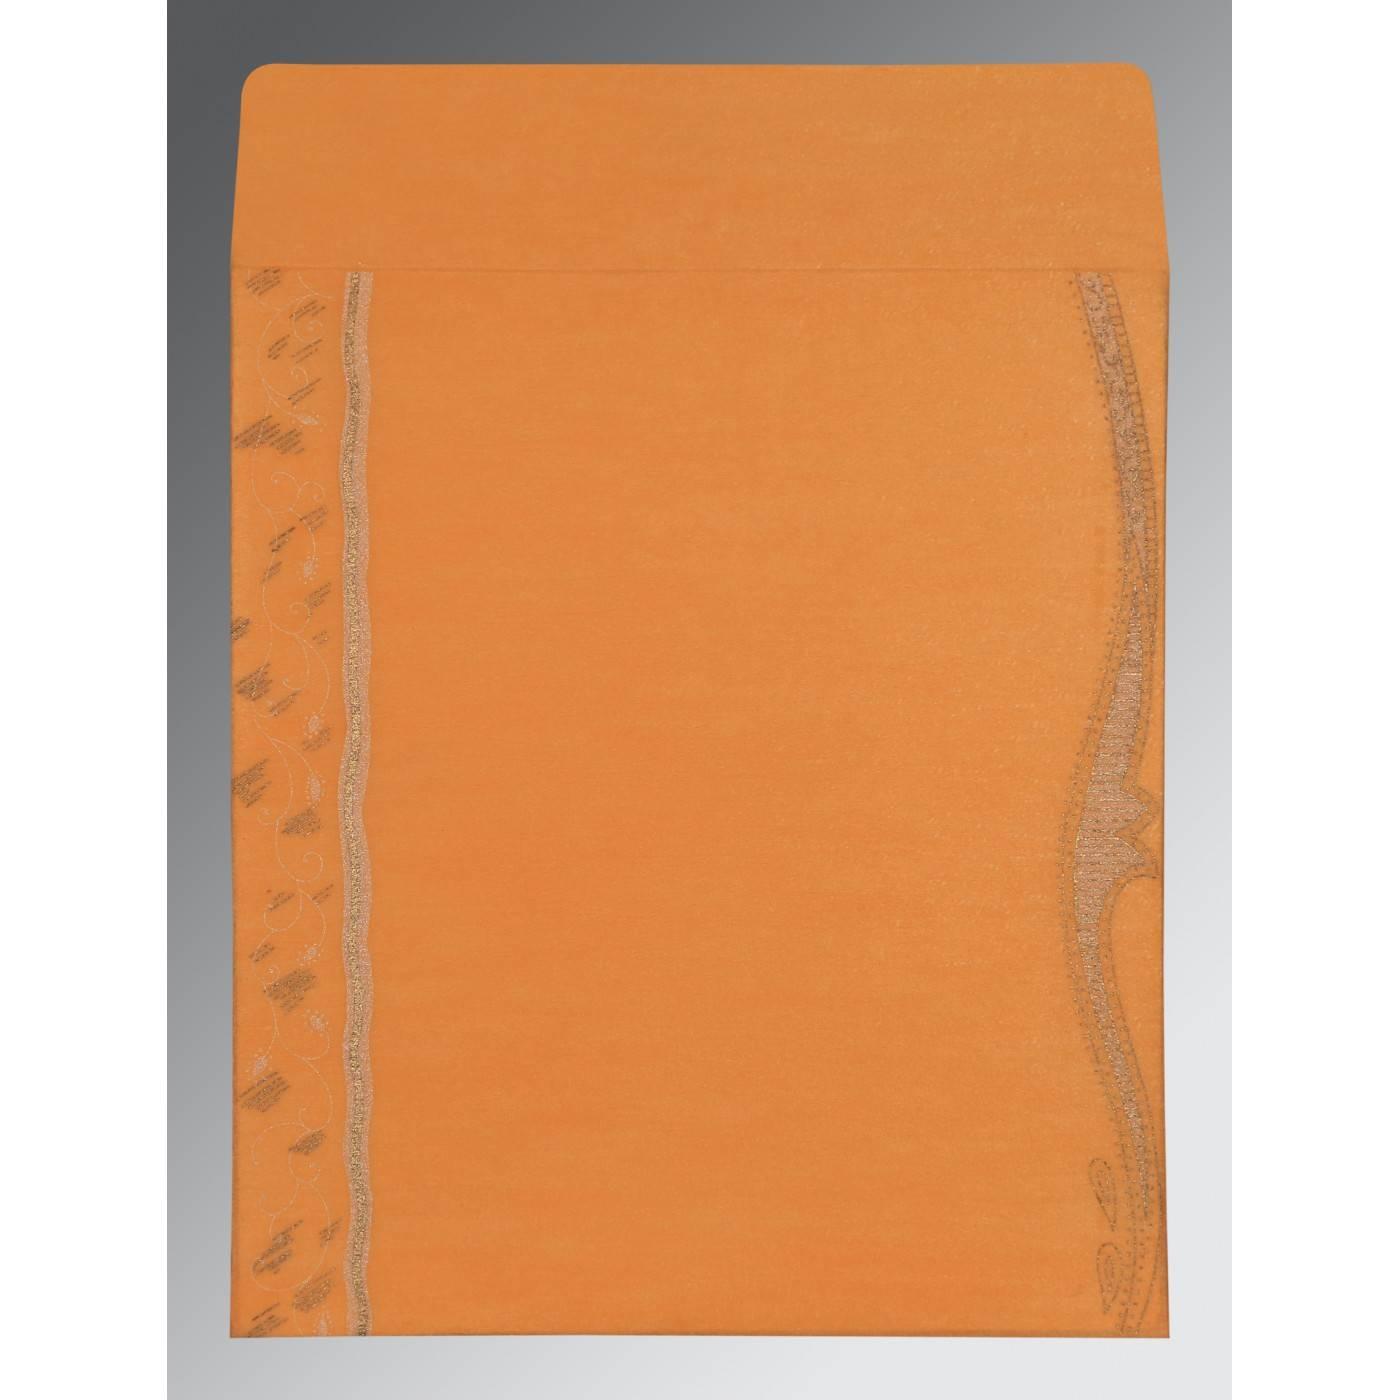 LIGHT ORANGE SHIMMERY EMBOSSED WEDDING CARD : CRU-8210L - IndianWeddingCards